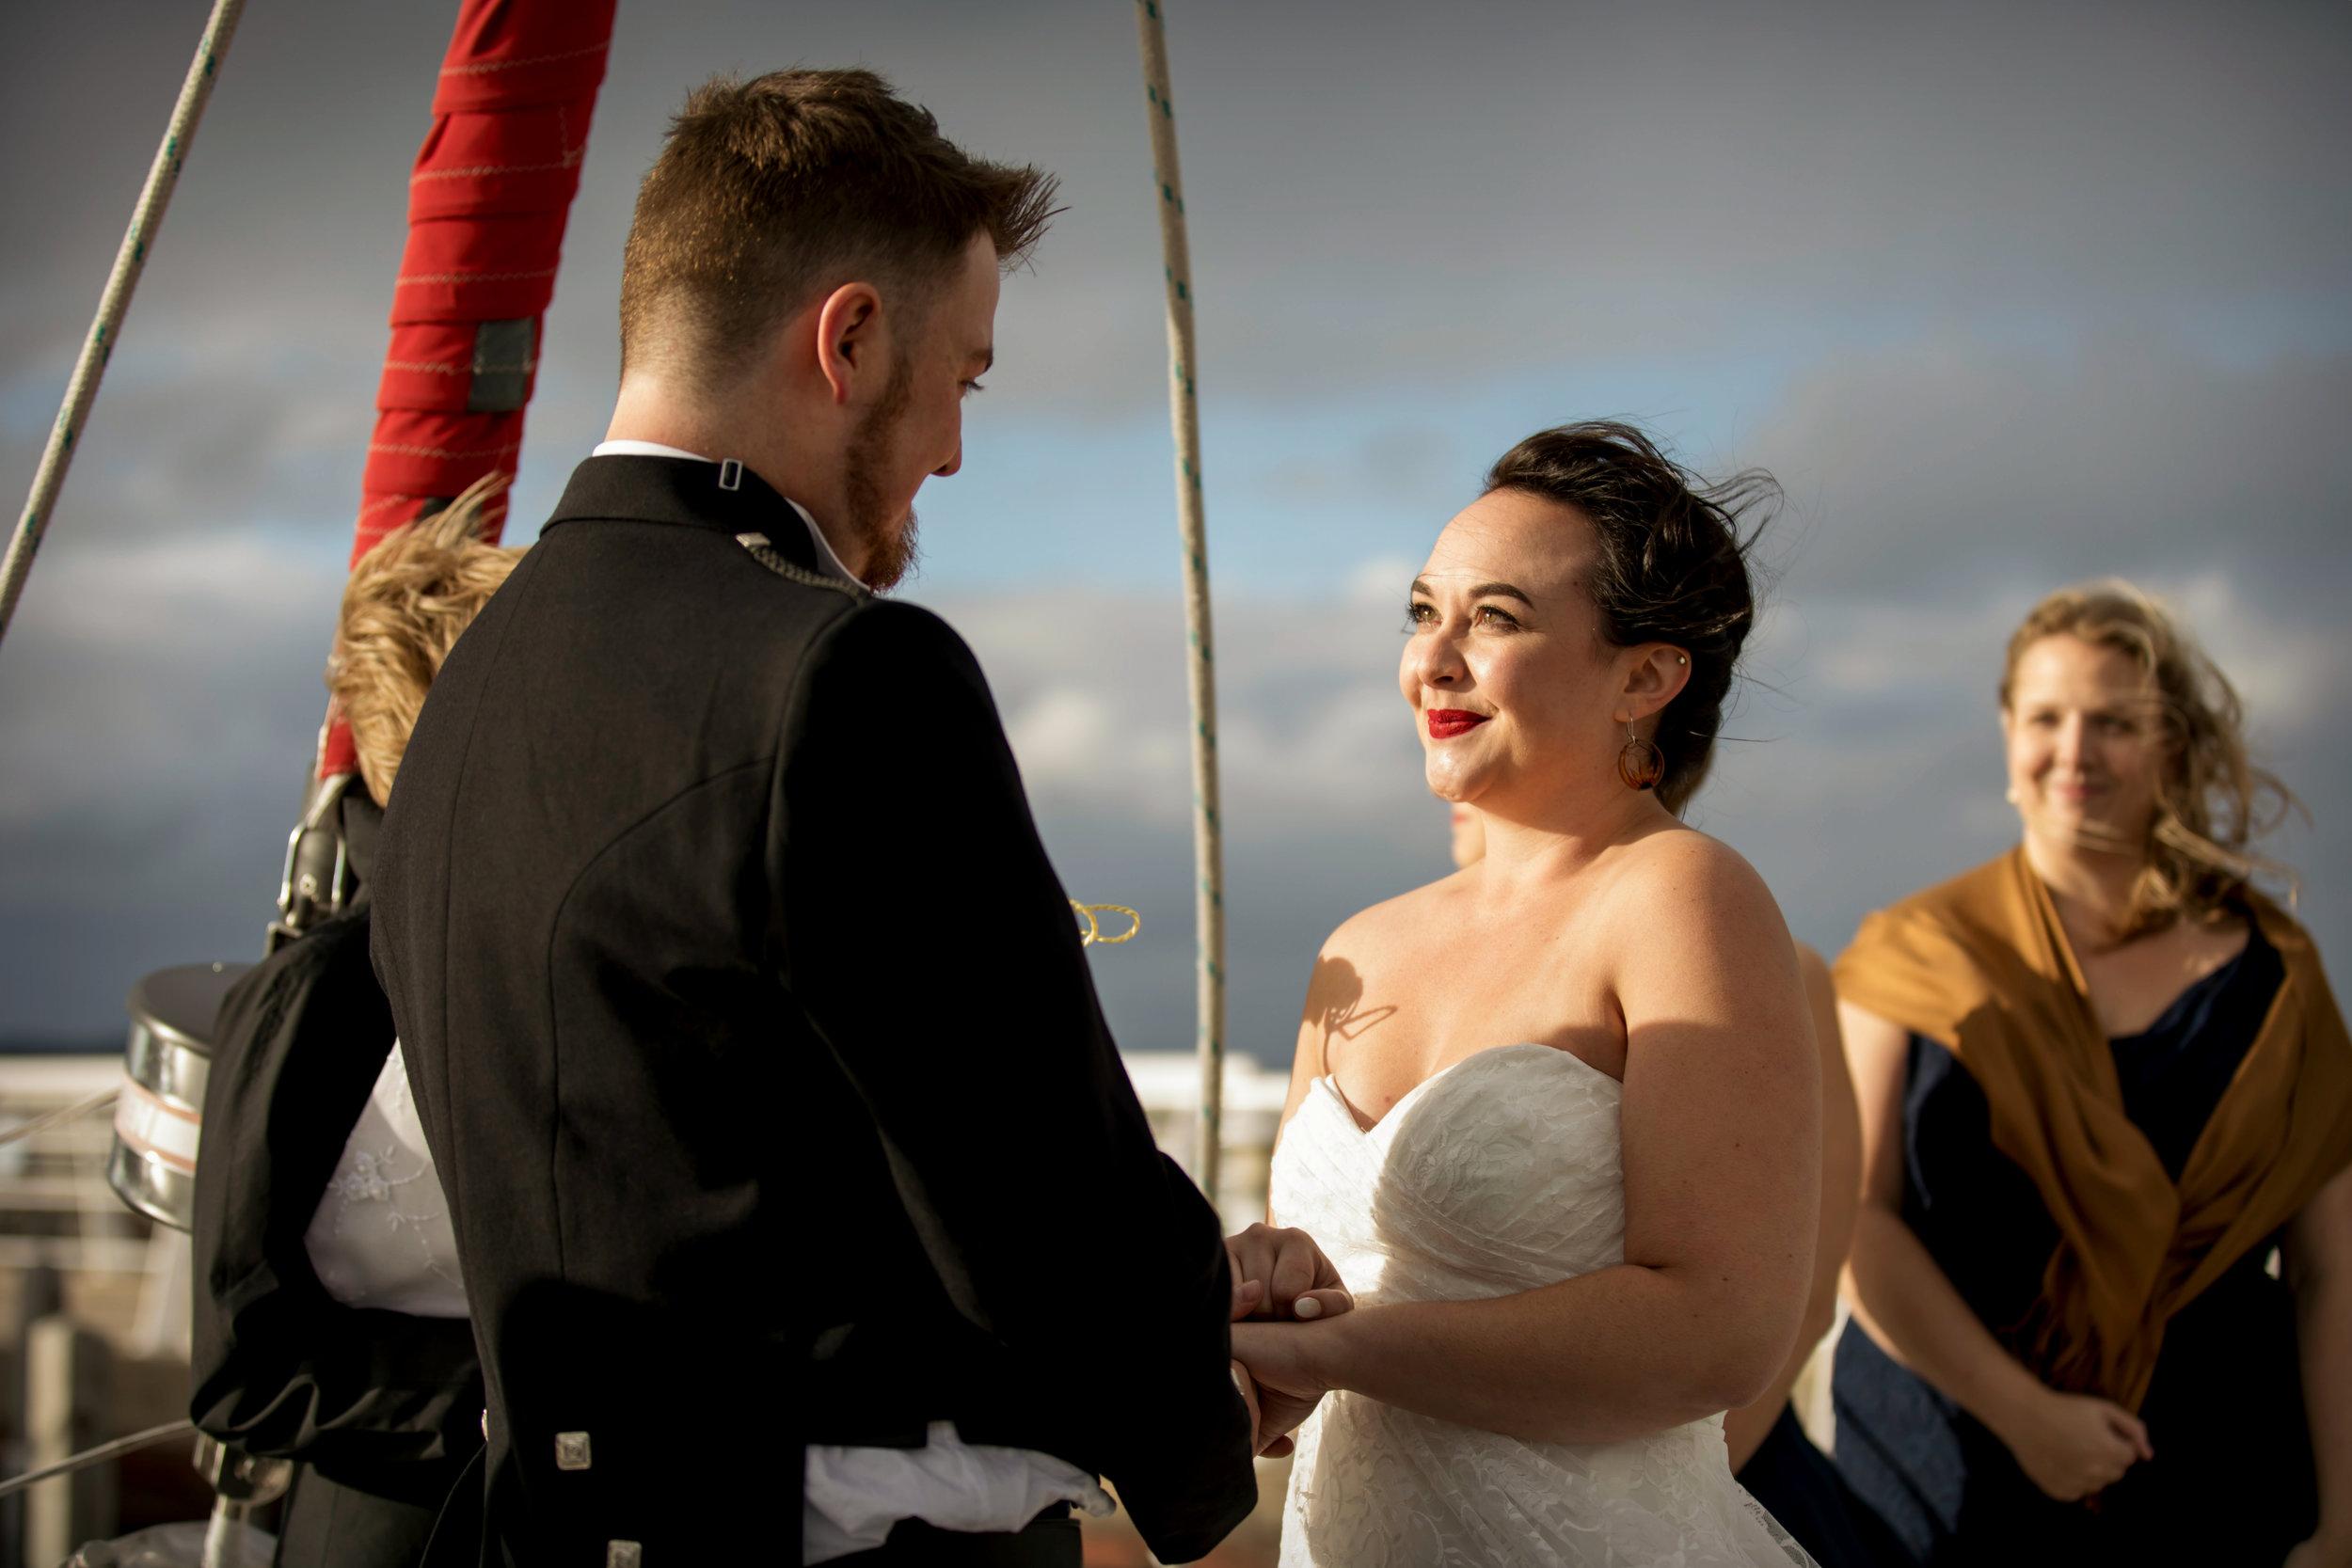 McNabb Wedding 9.21.2018 & 9.22.2018 Traverse City, Michigan.